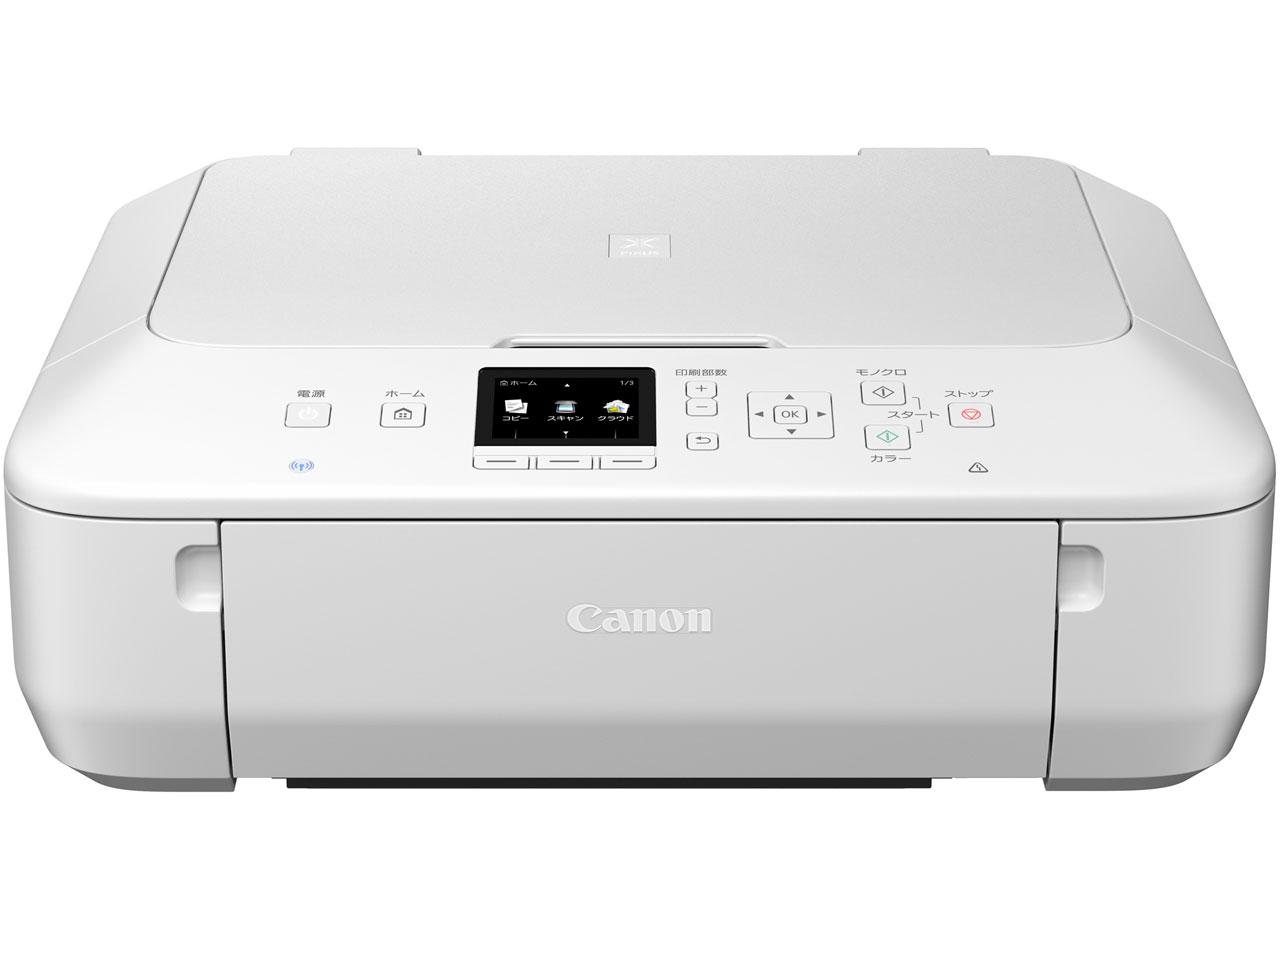 PIXUS MG5530 [ホワイト] の製品画像